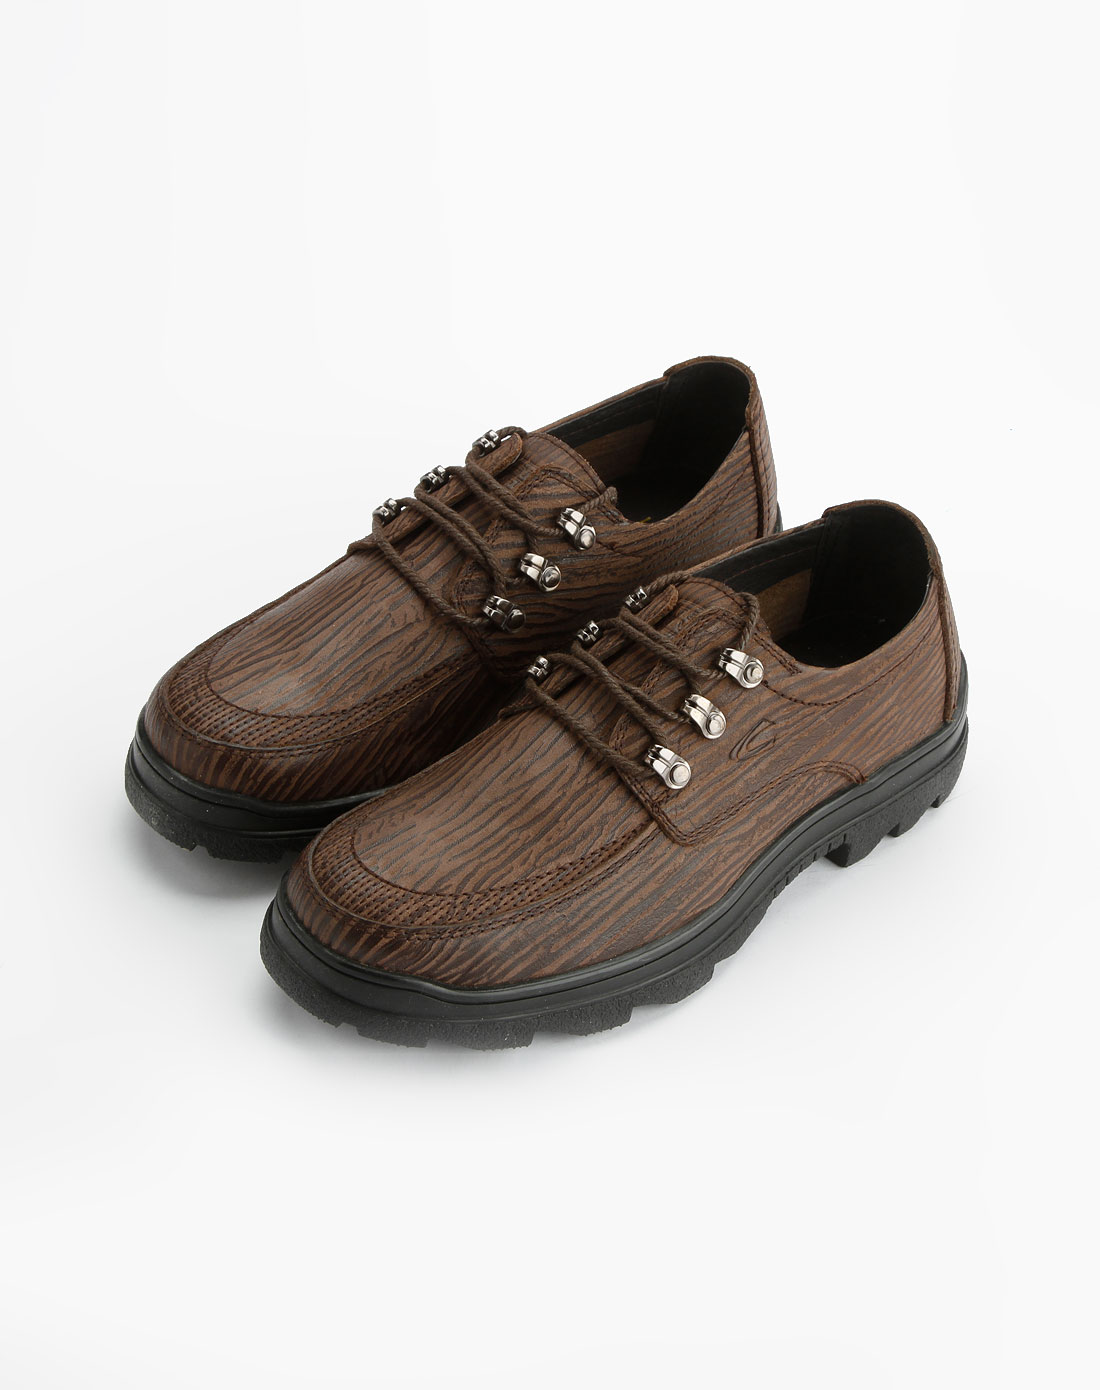 active男款啡色树纹系带皮鞋